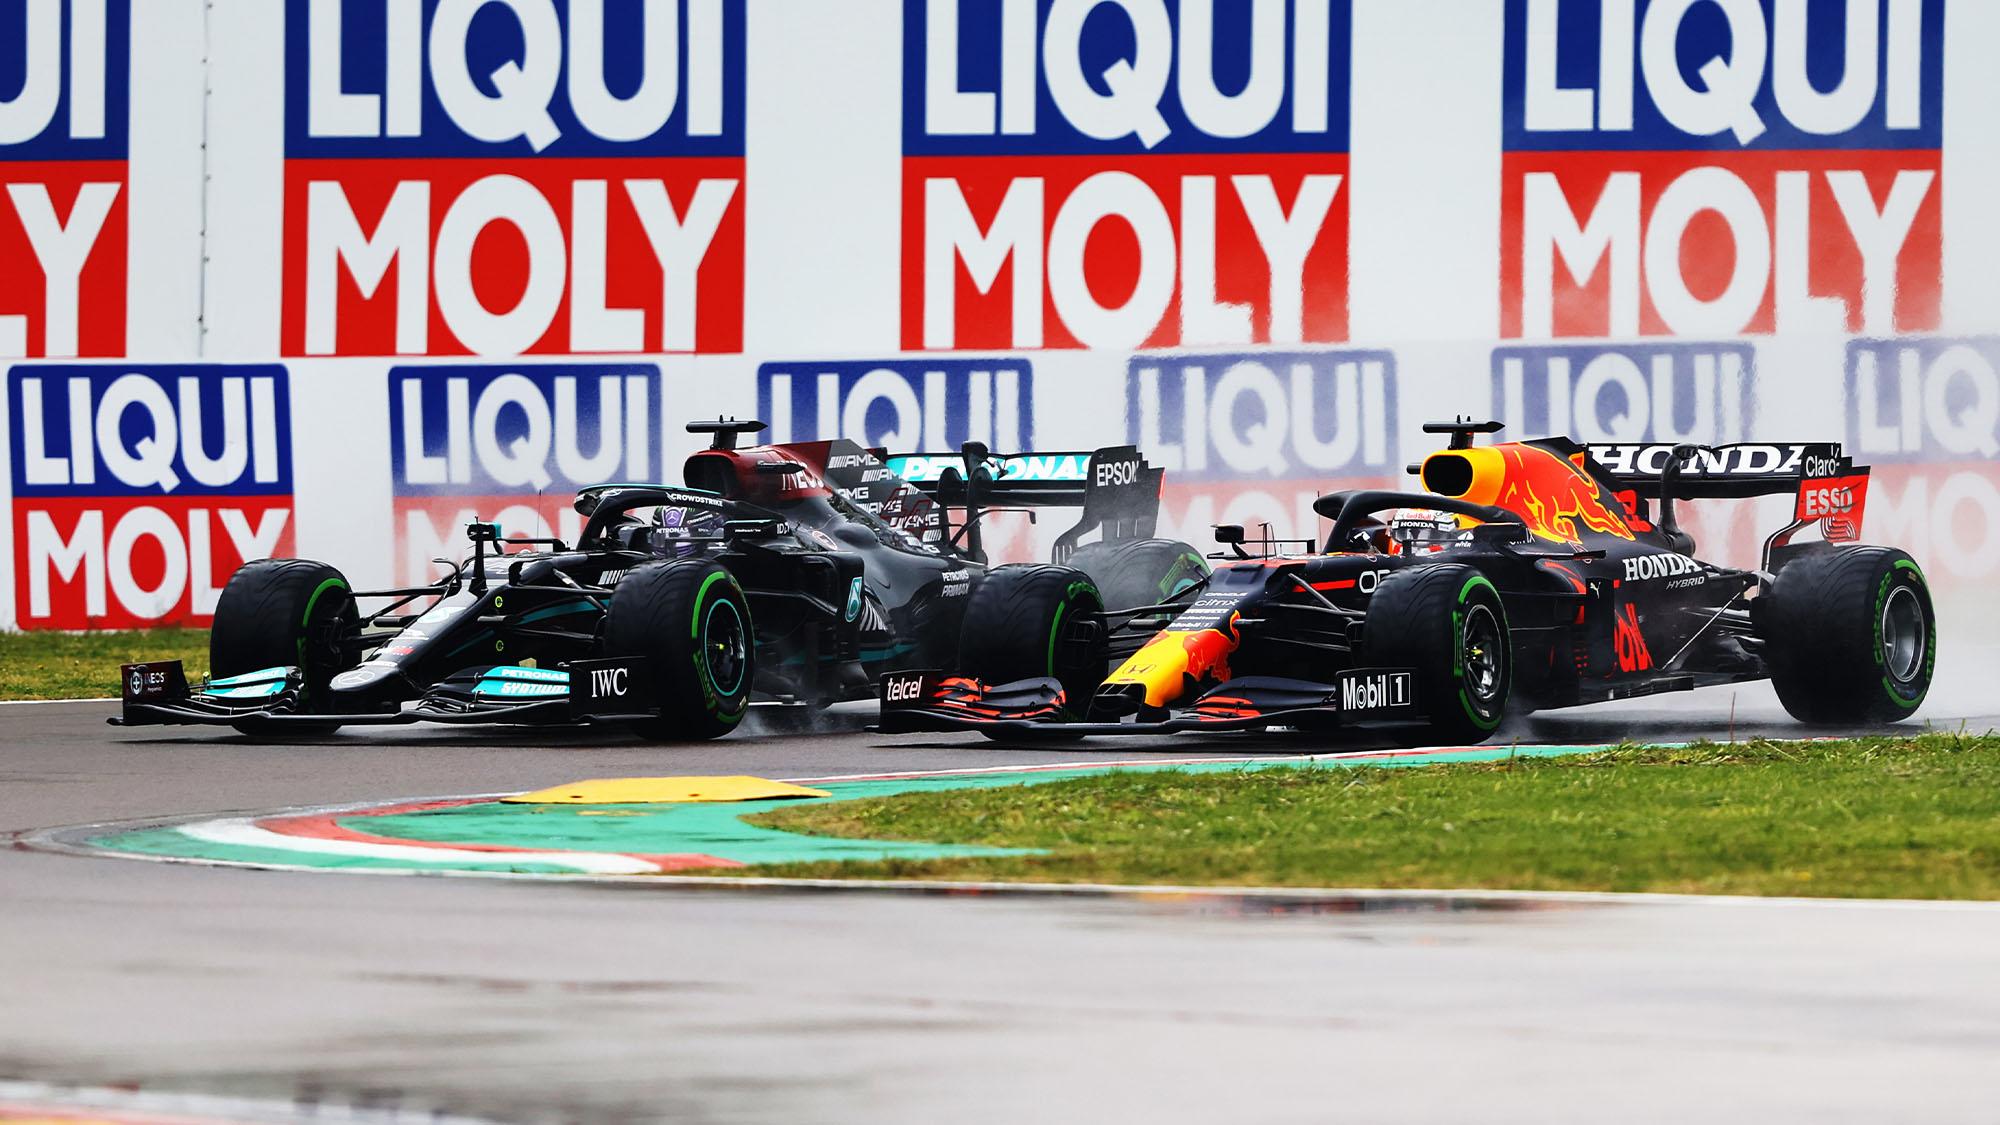 Hamilton Verstappen imola 2